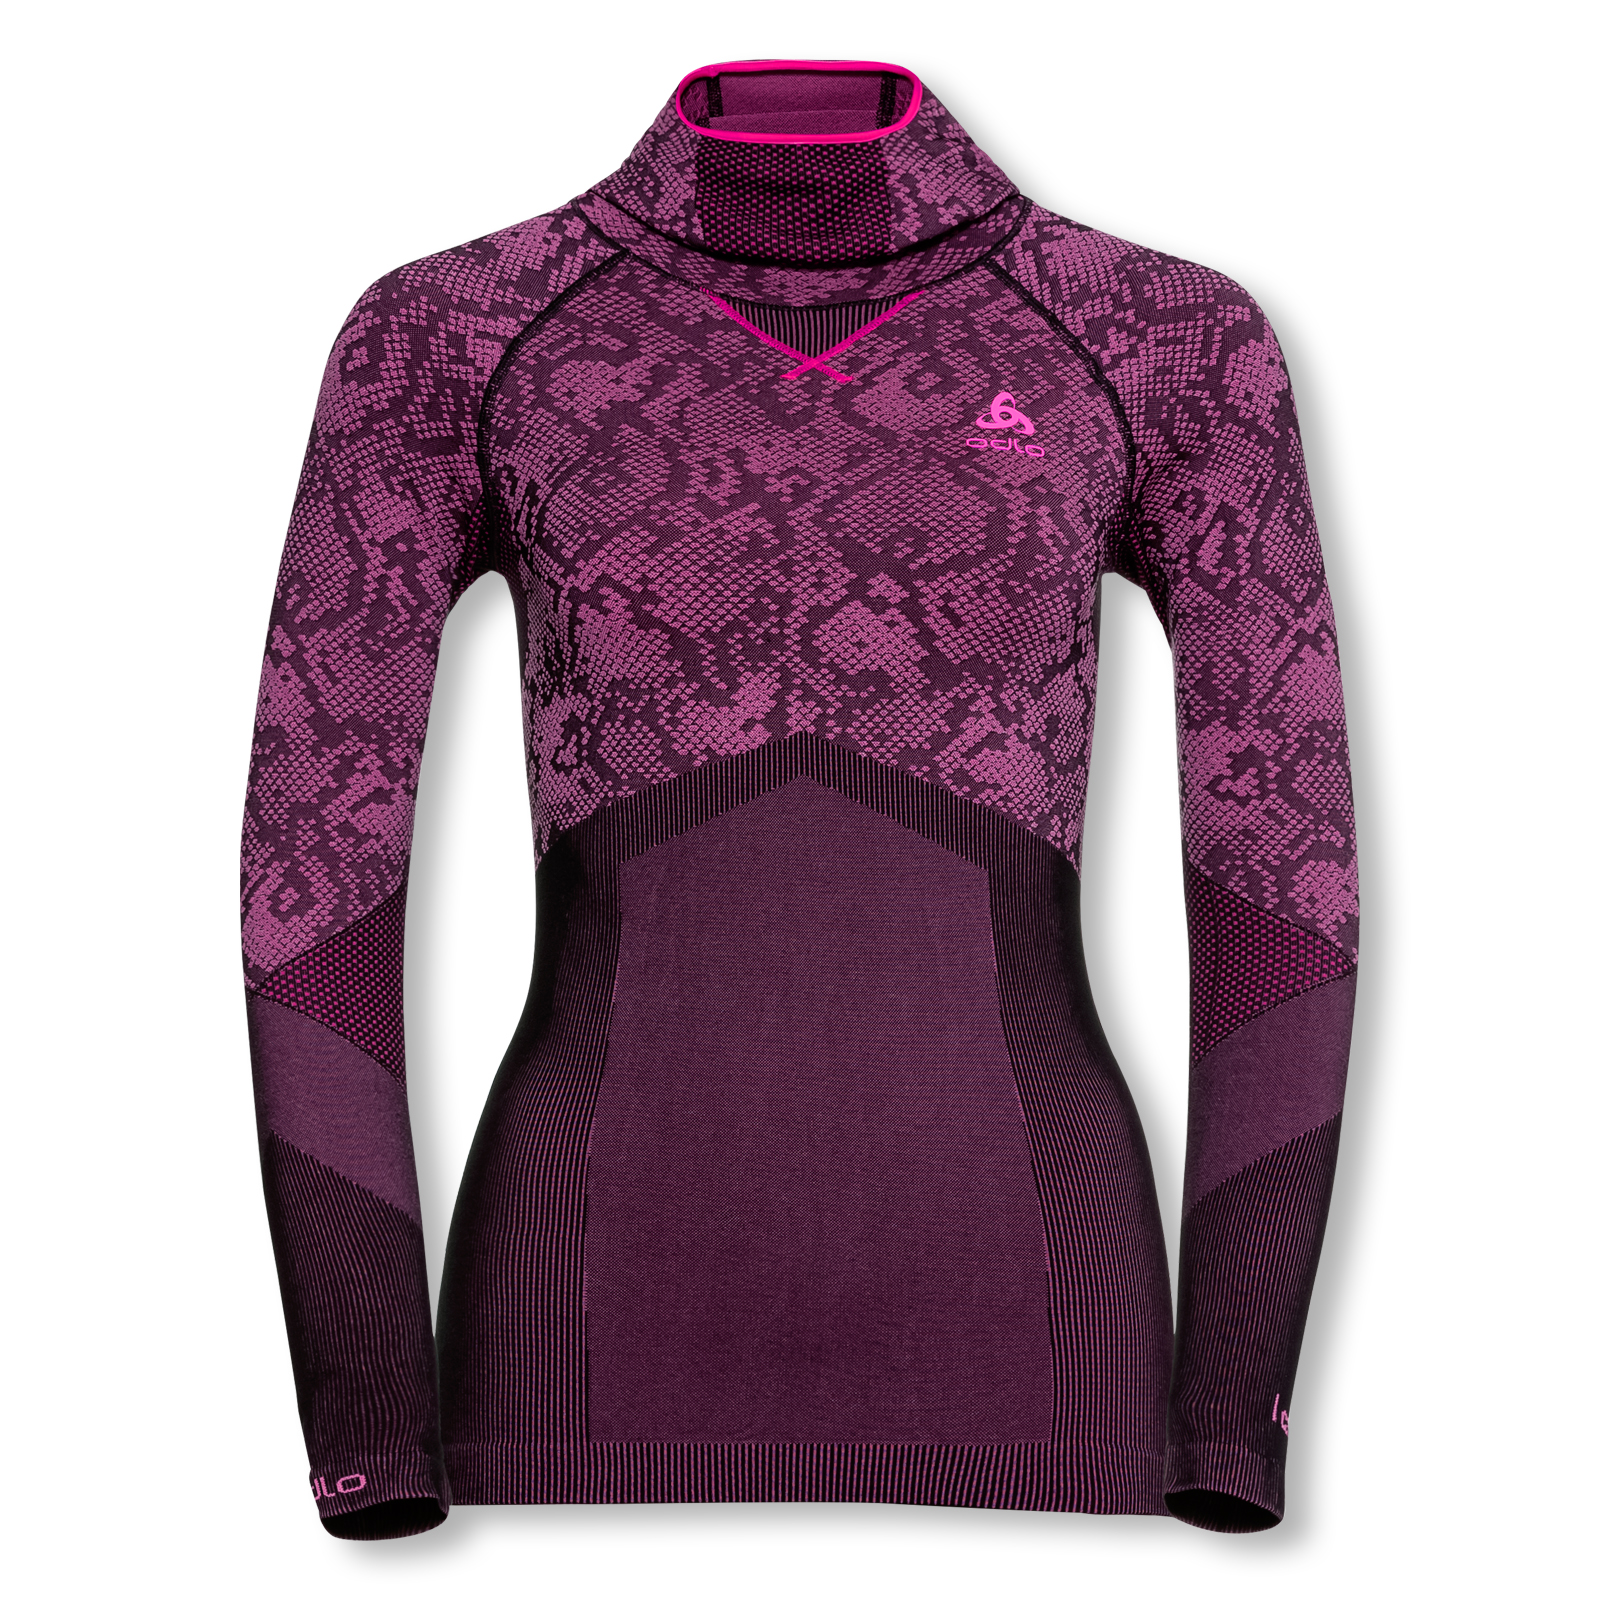 Odlo Damen Funktionsshirt langarm Skiunterwäsche Blackcomb EVOLUTION WARM 170991 S M L in black / pink go